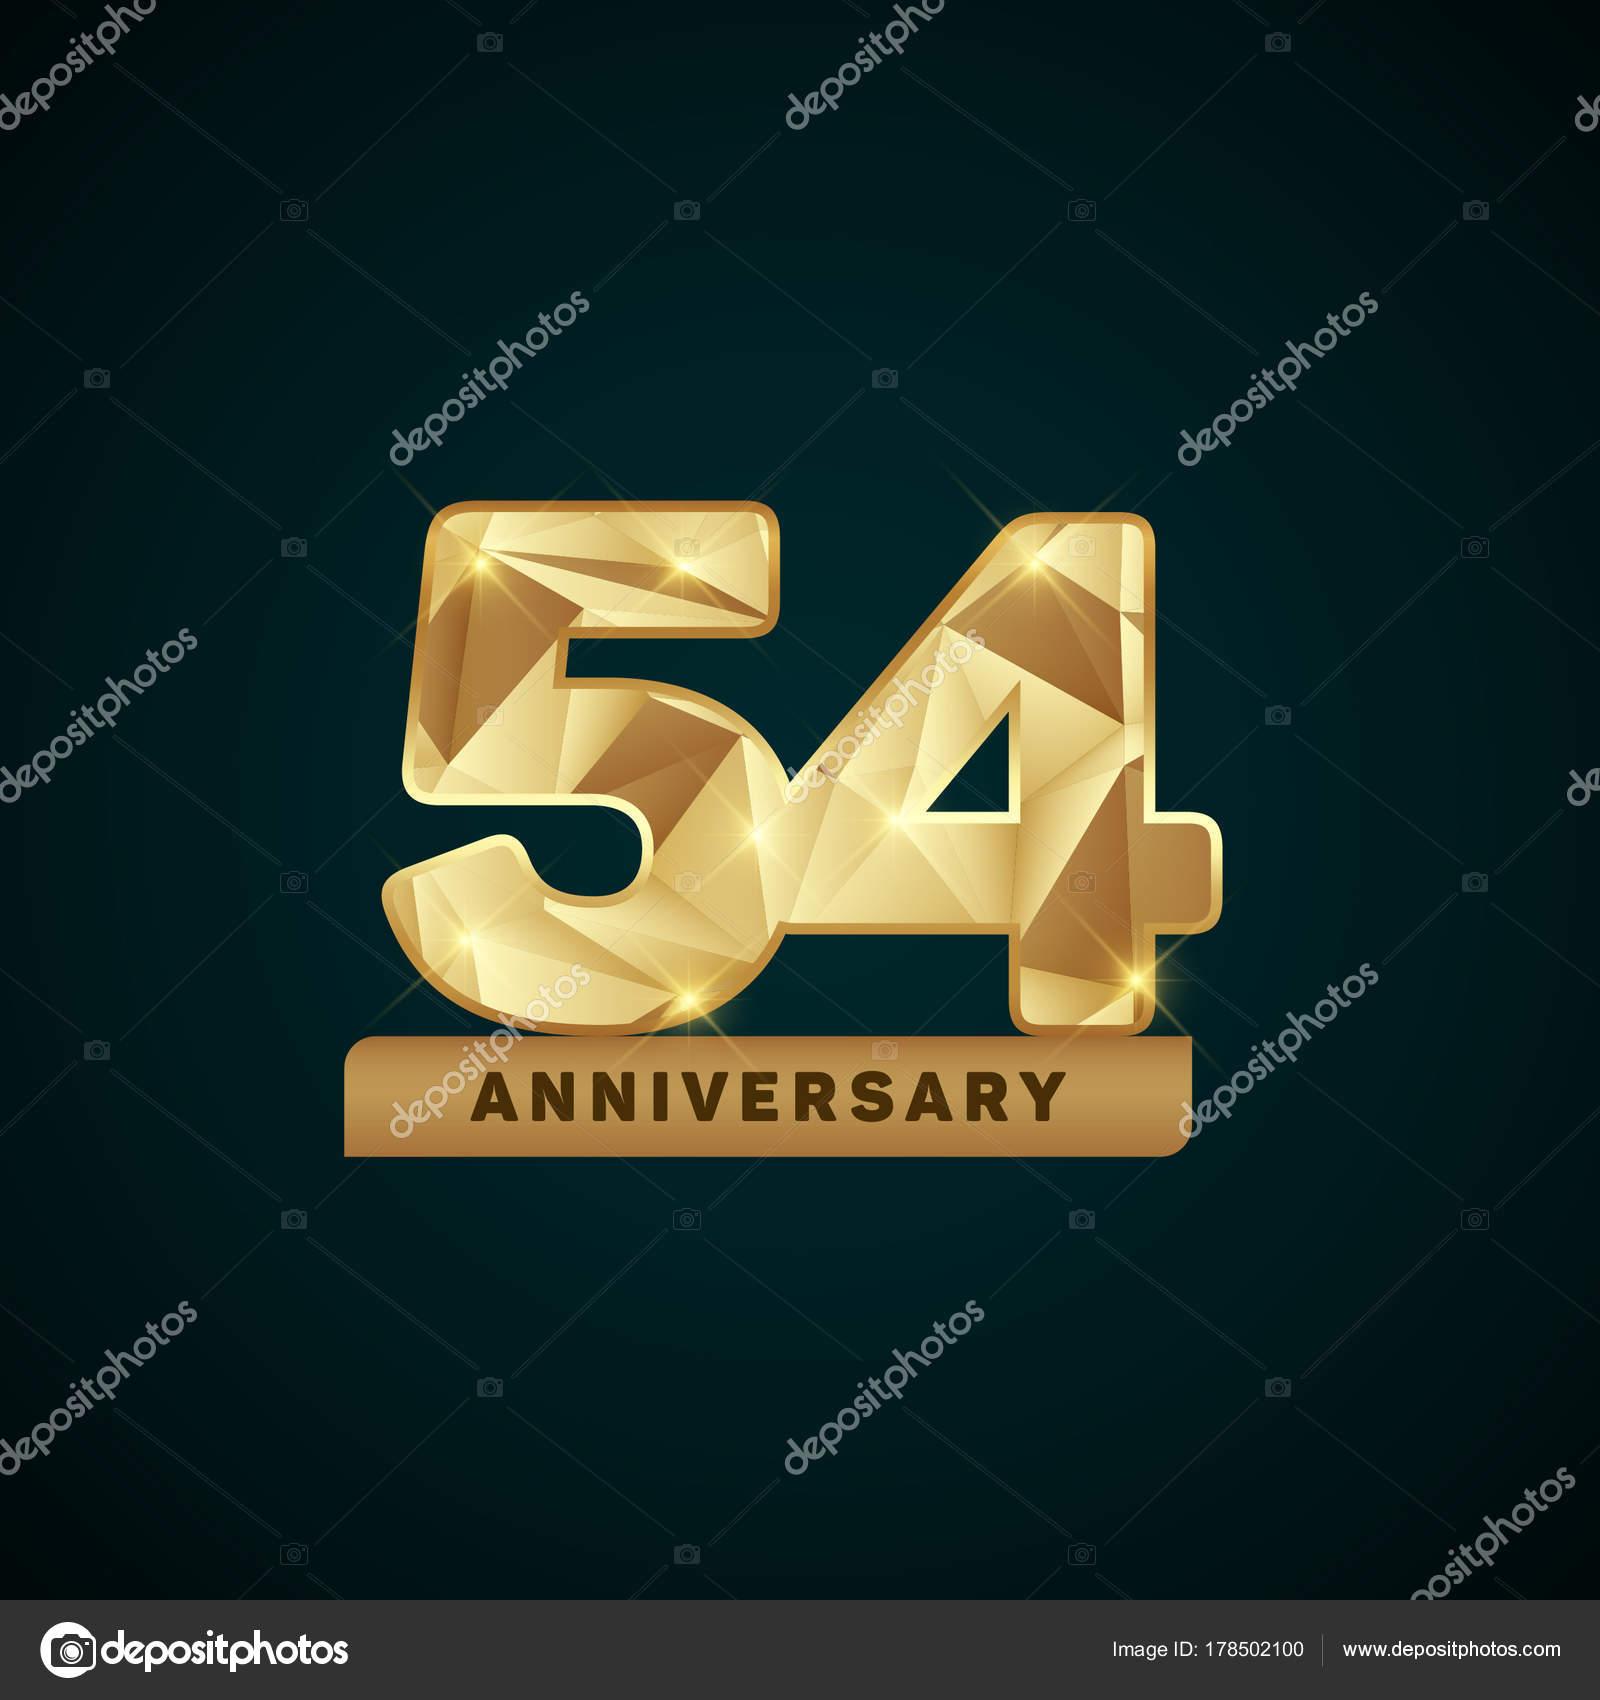 logo anniversaire 54 ans image vectorielle seklihermantaputra 178502100. Black Bedroom Furniture Sets. Home Design Ideas